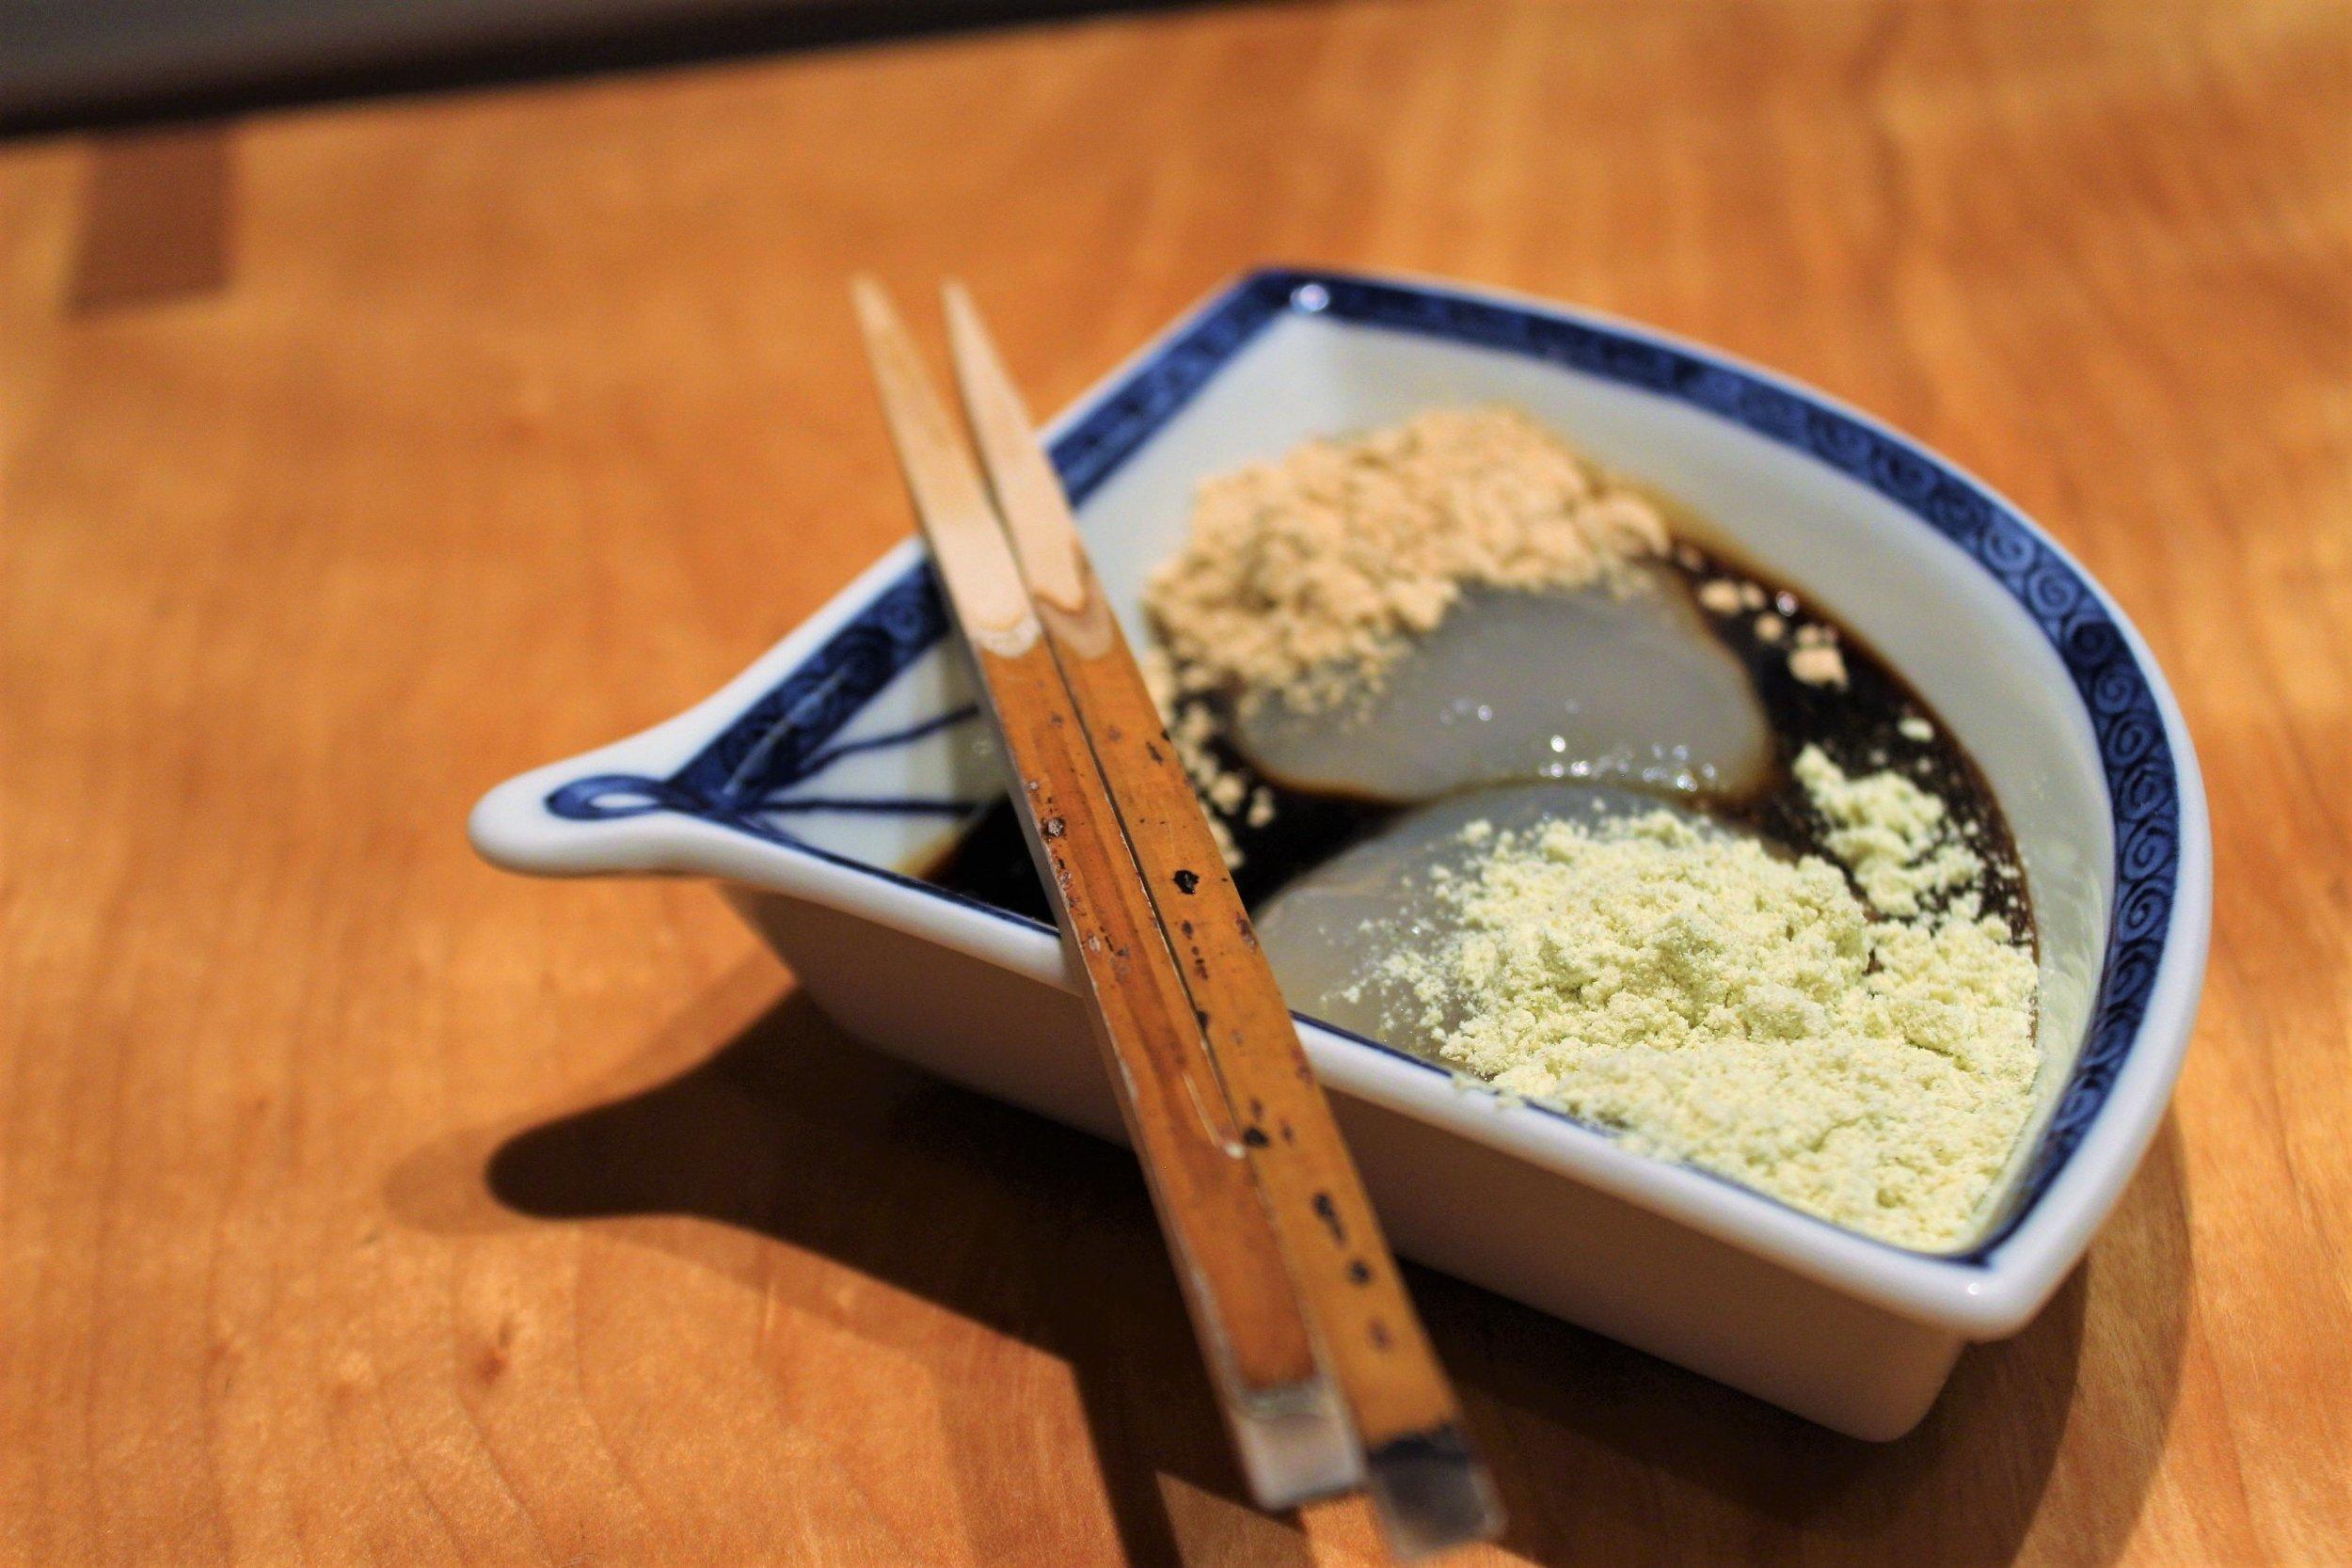 Warabi-mochi Bracken Starch Jelly covered in Kinako Toasted Soybean Flour at Kien in Tokyo, Japan